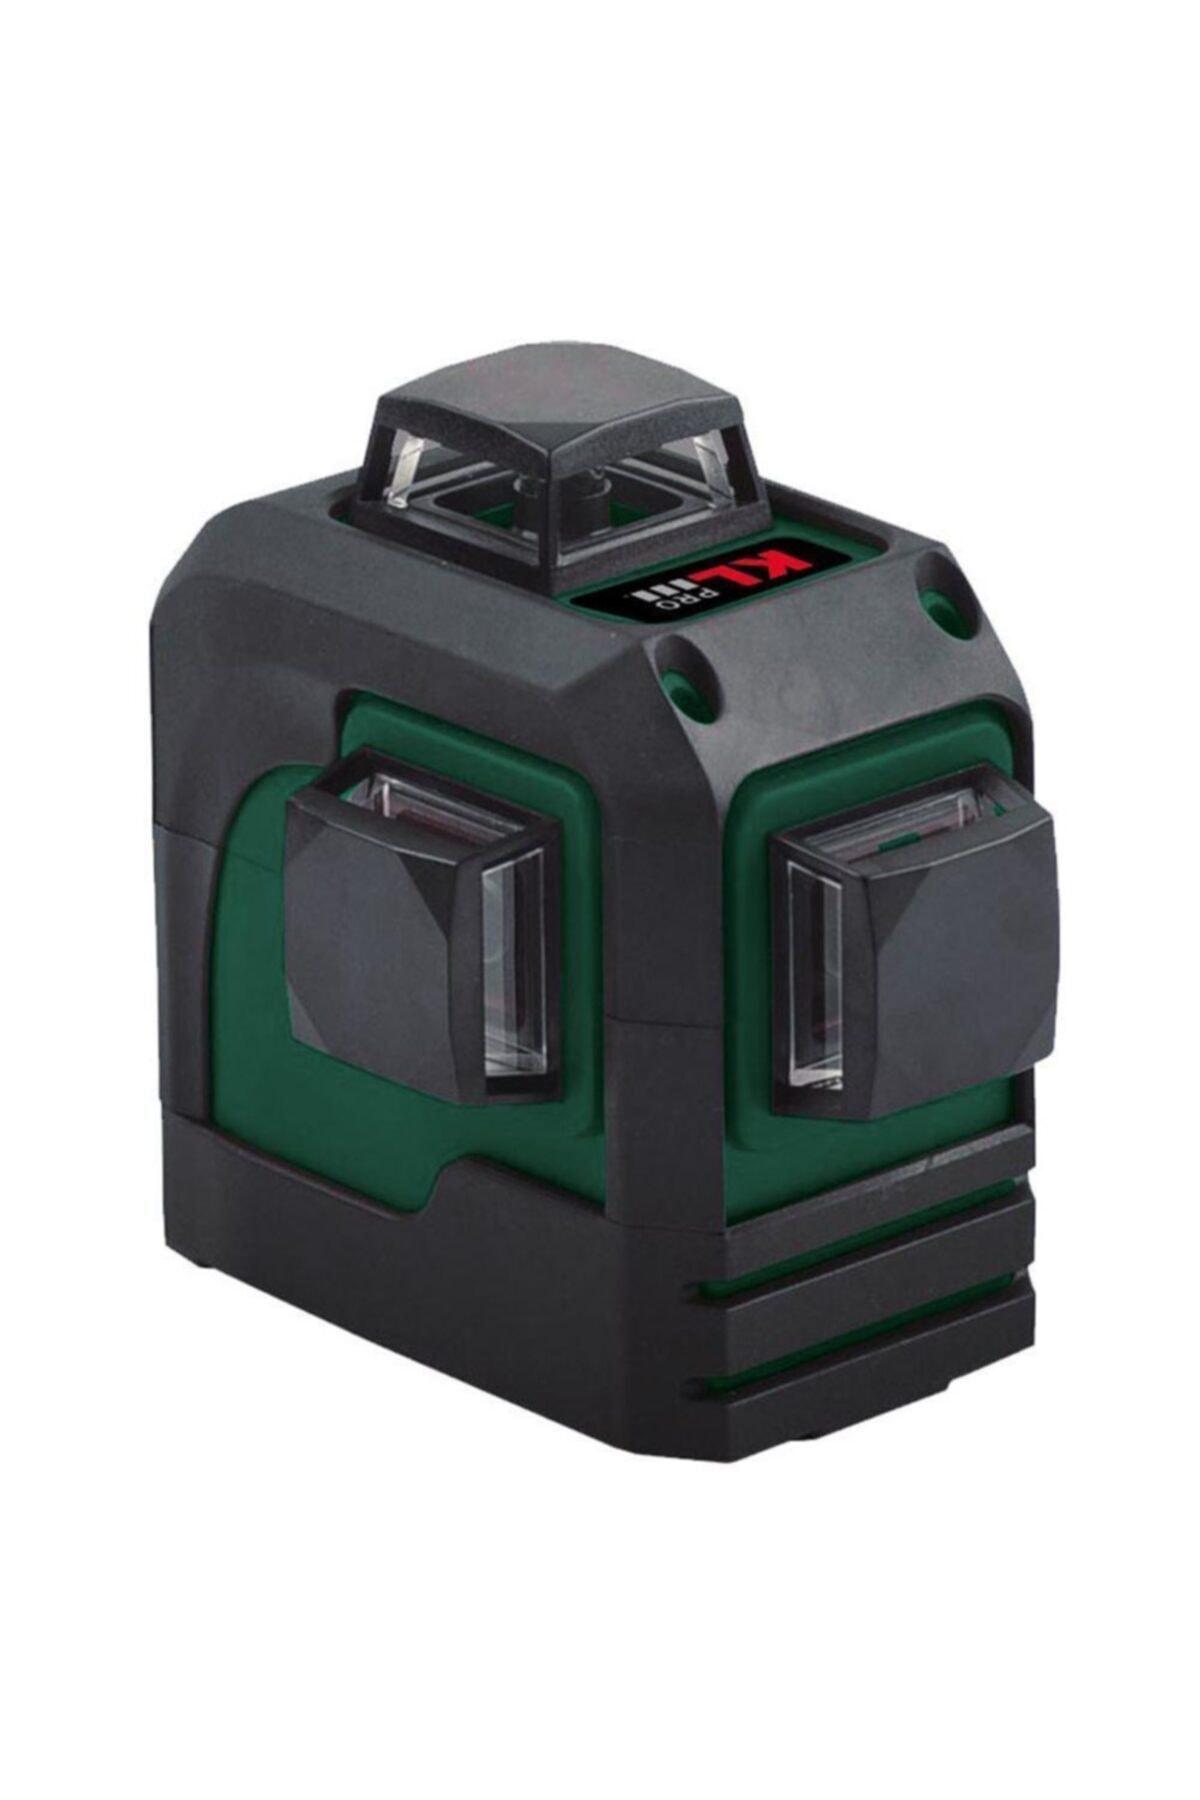 KLPRO Kllzr93 Profesyonel Yatay, Dikey Ve 90° Hizalamalı Çizgi Lazer Distomat 1